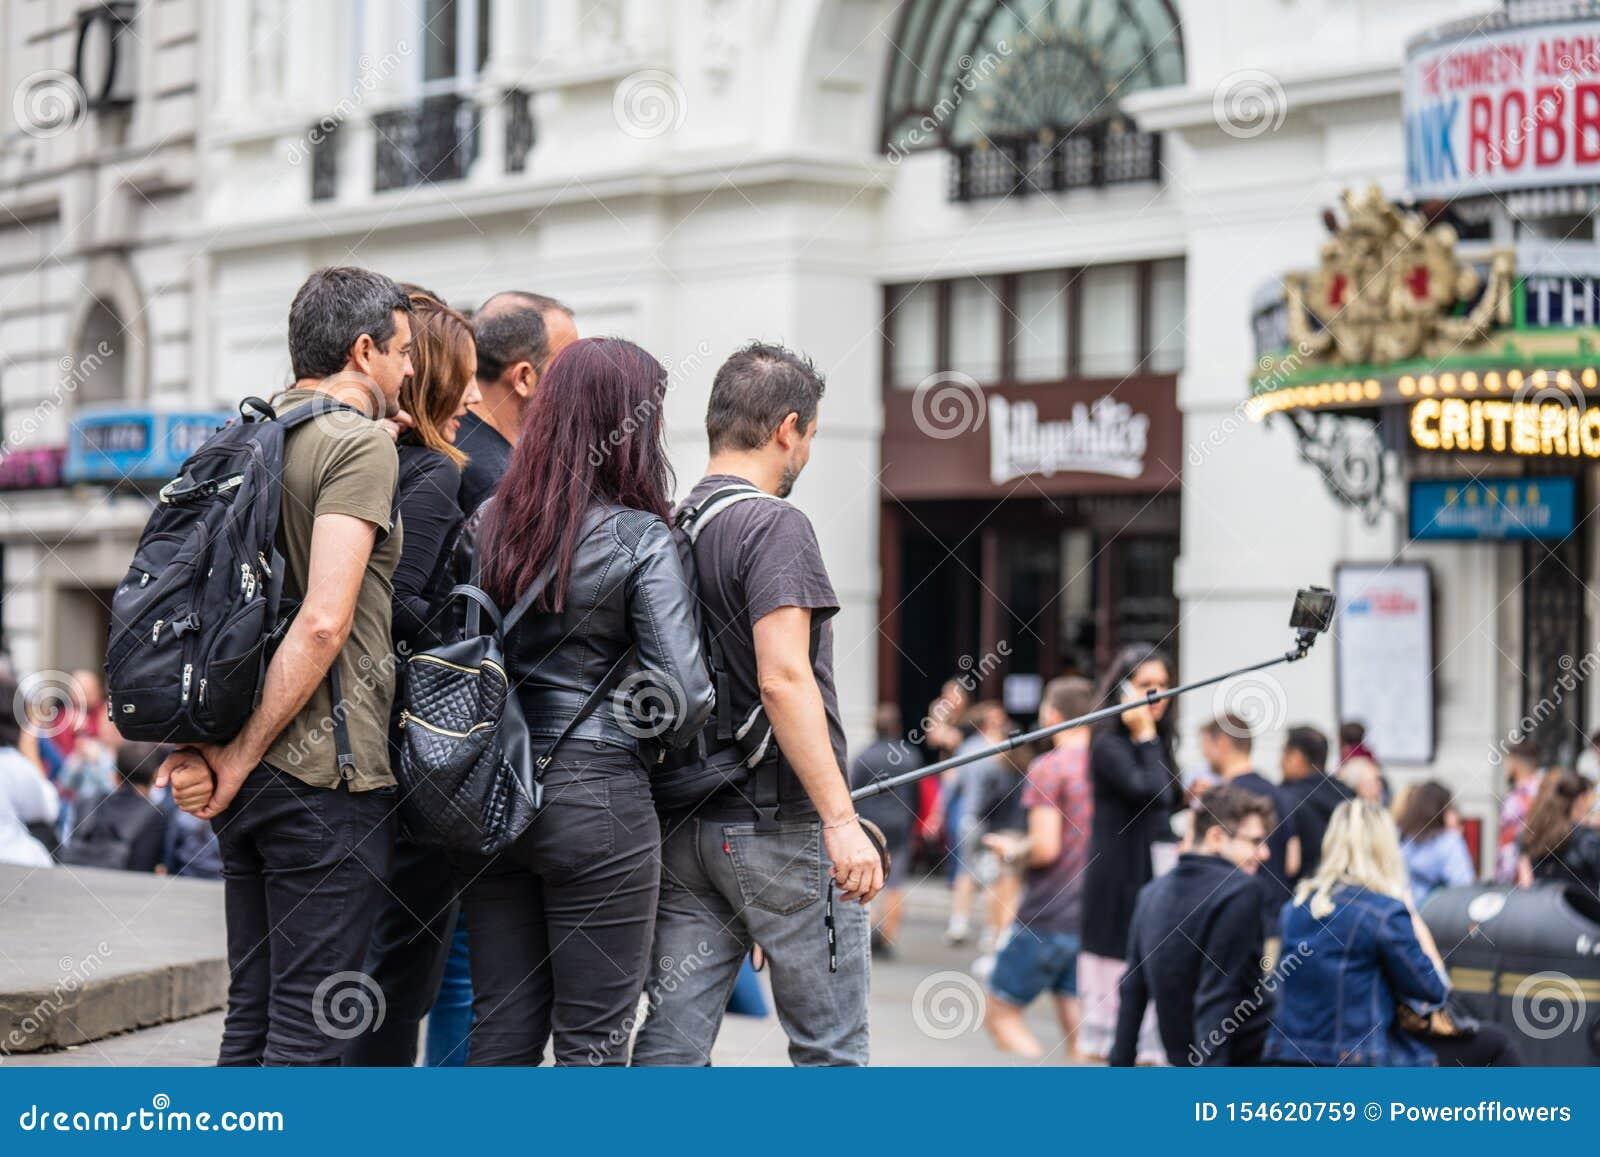 London, UK, July, 2019. Close up portrait of happy attractive people taking selfie in London